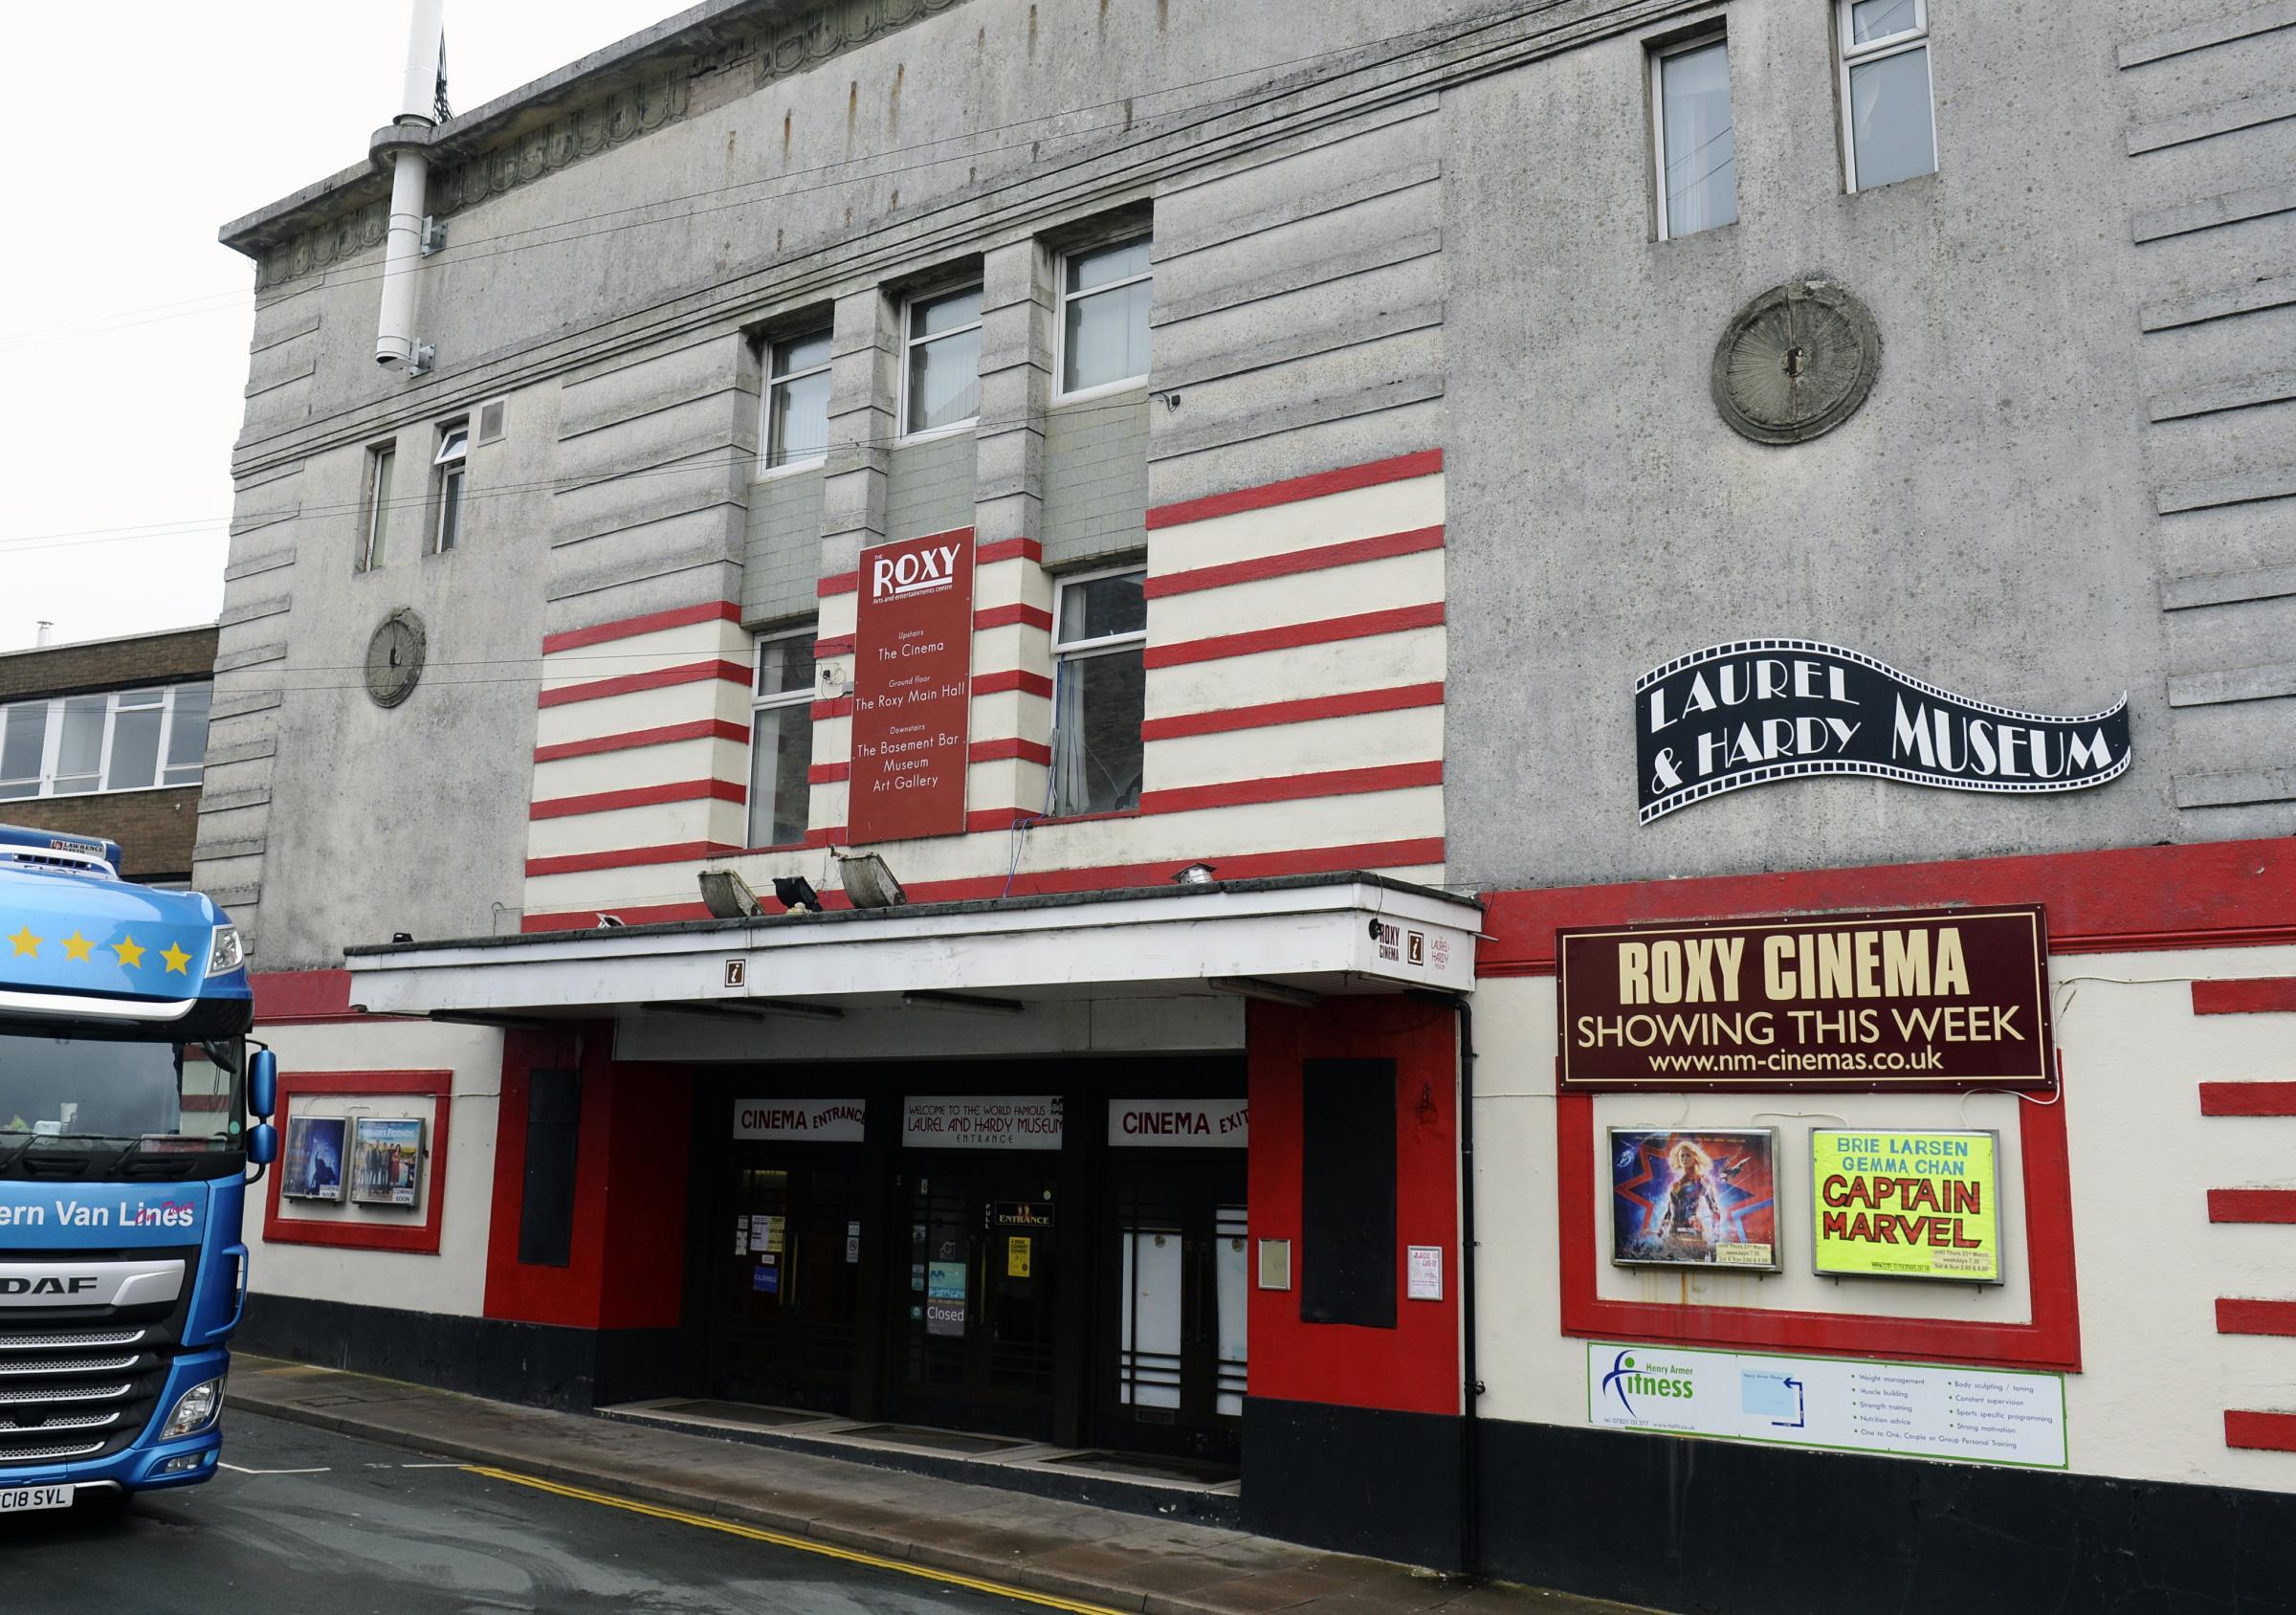 Award winning refugee film to be shown in Ulverston